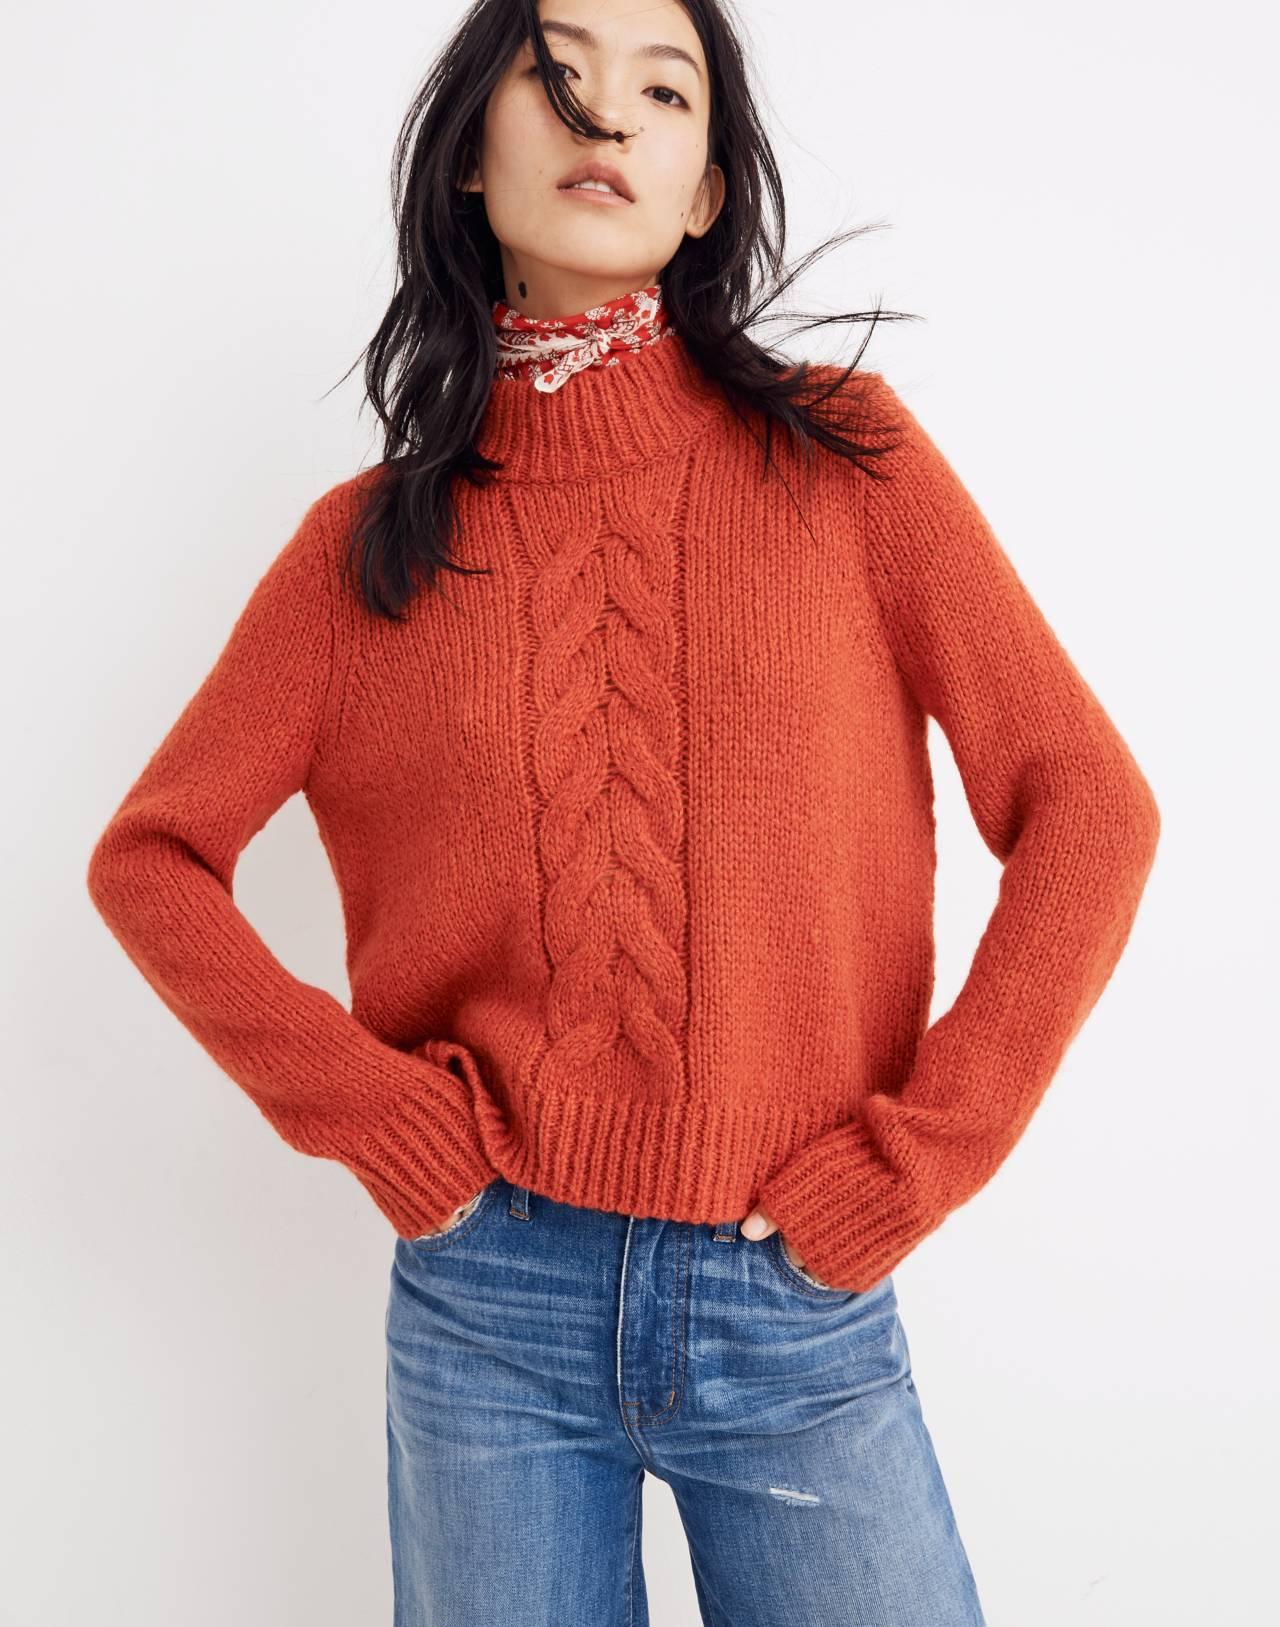 Bayfront Turtleneck Sweater in bright scarlett image 1